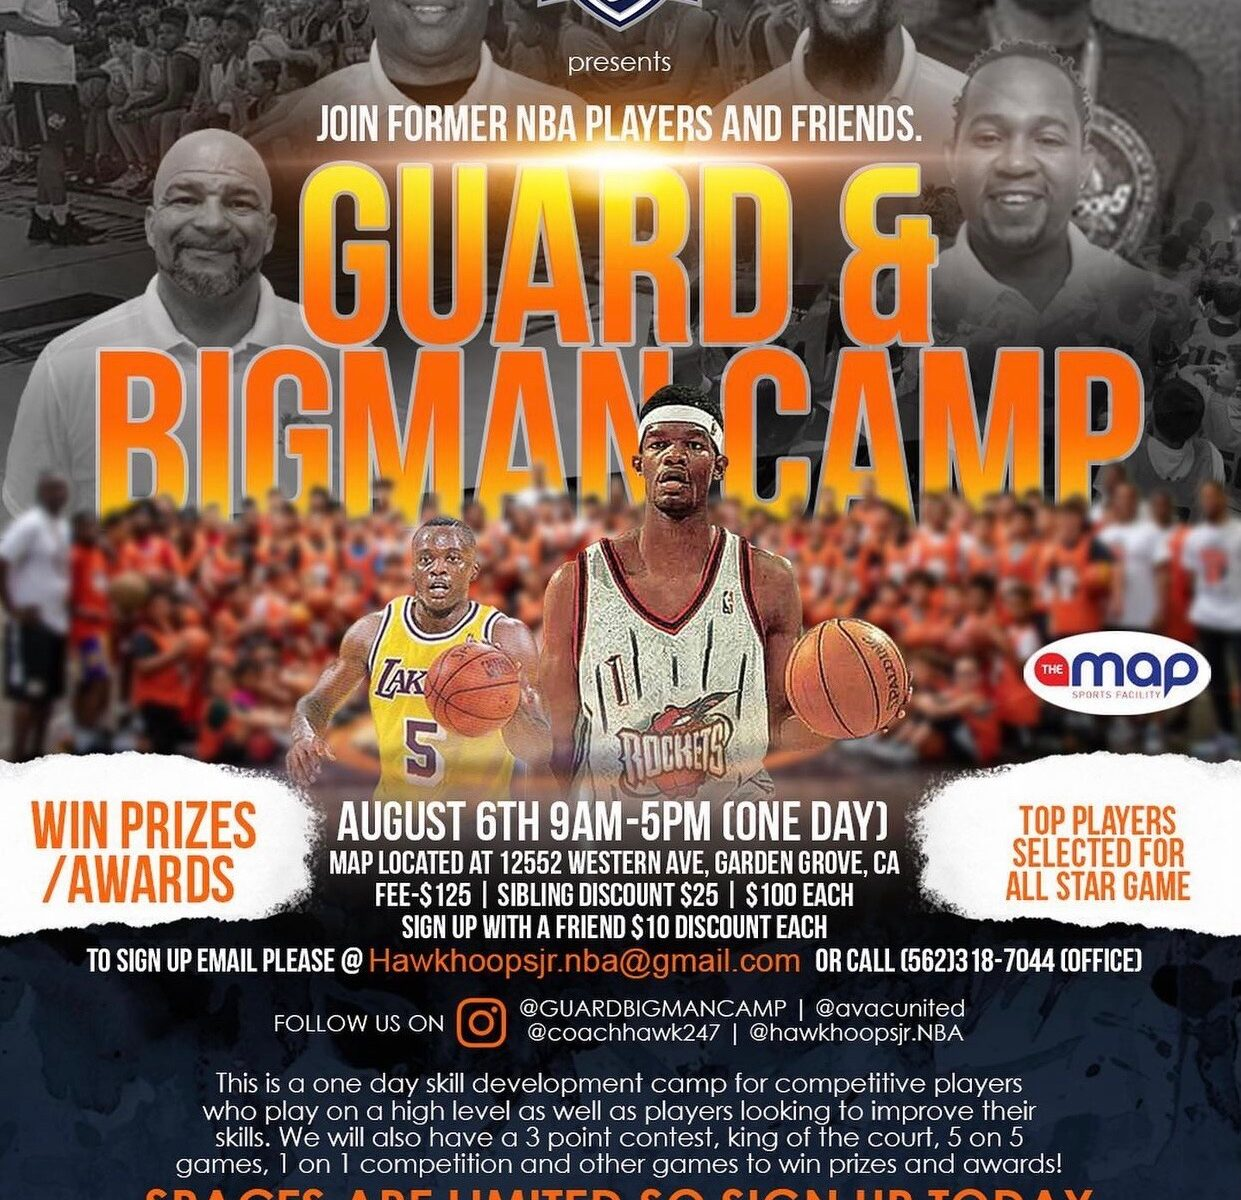 guard_bigman_camp_2021